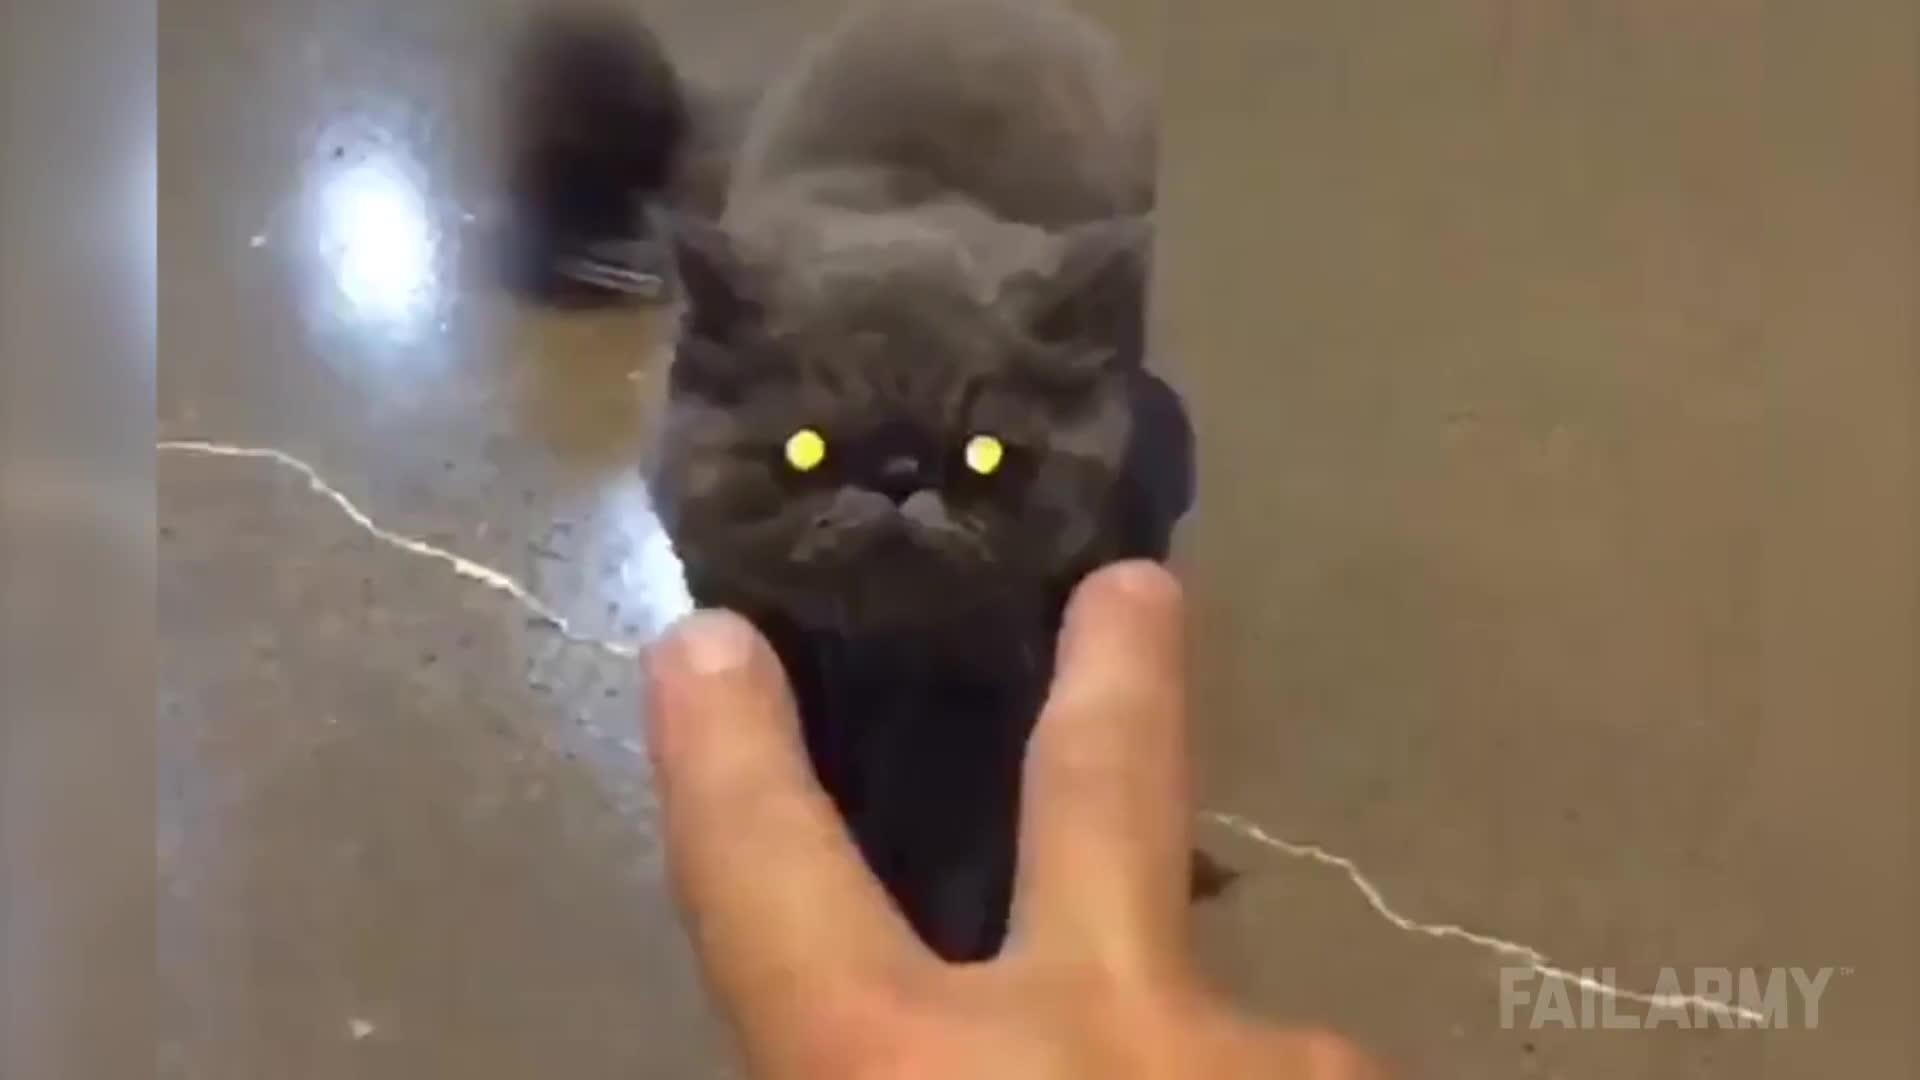 fail, failarmy, fails, Cats Being Jerks Video Compilation (April 2015) || FailArmy GIFs